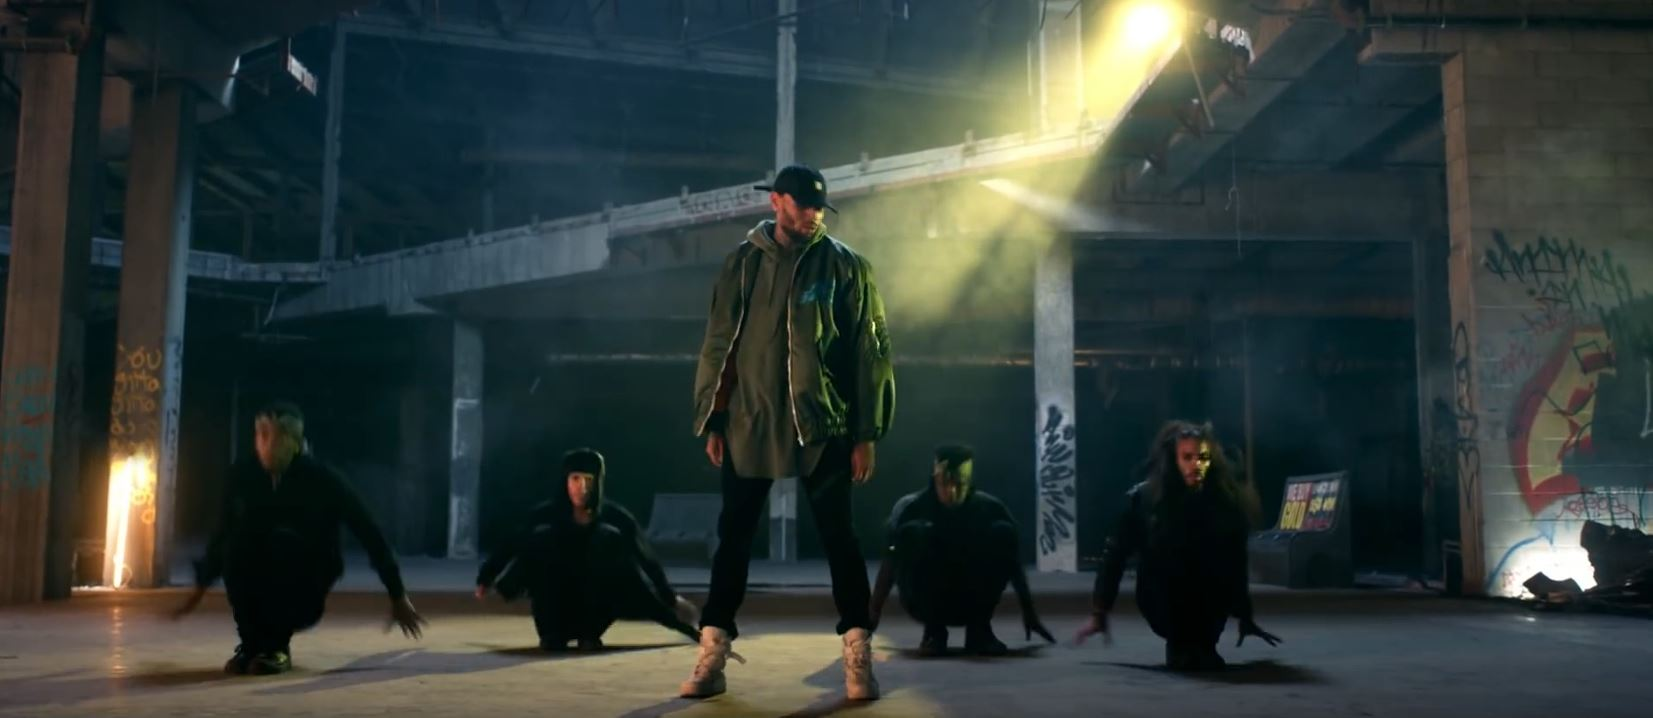 Calvin Harris, Steve Aoki o Chris Brown suenan en Funk & Show